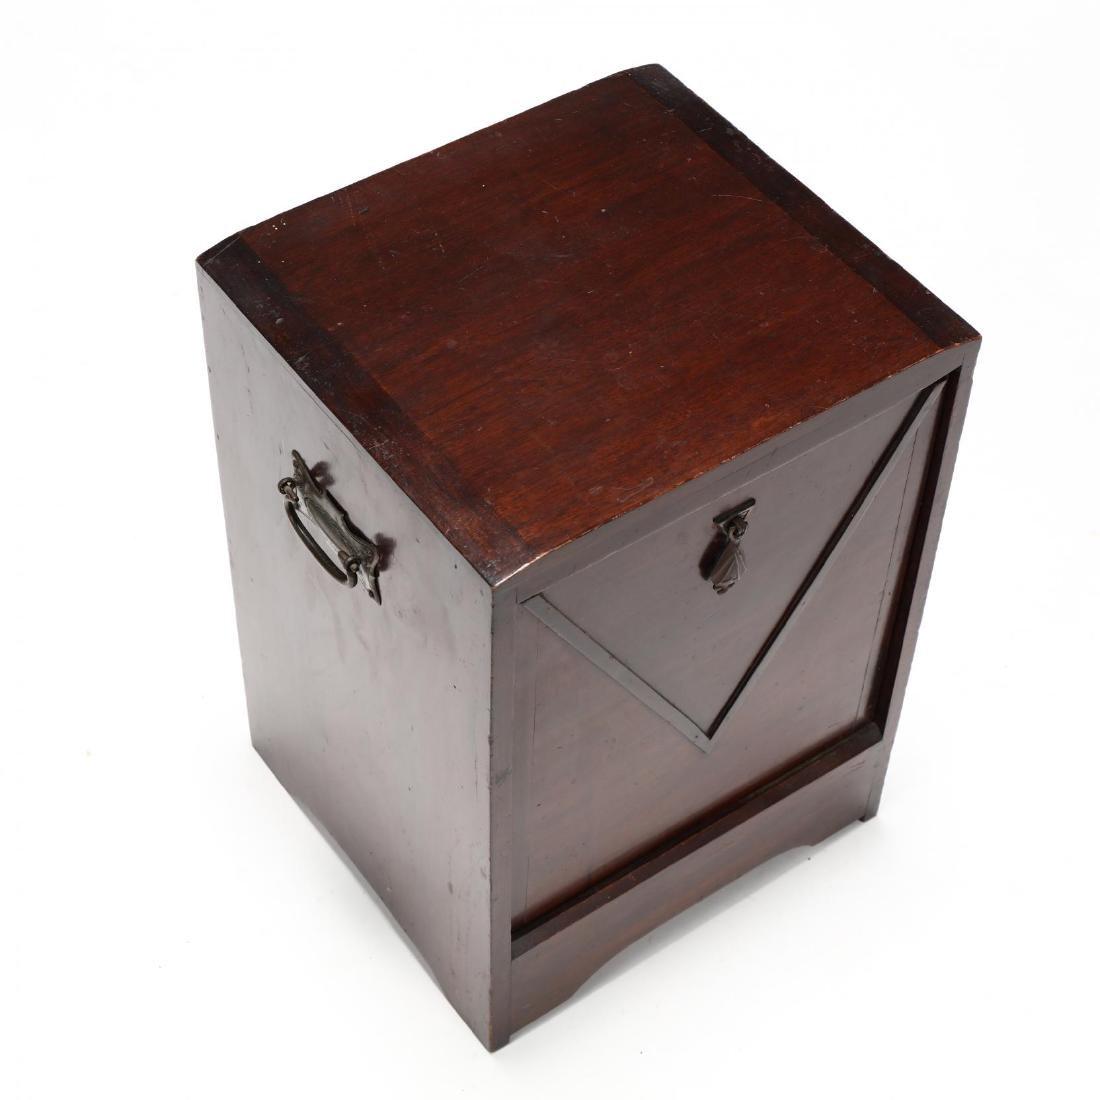 English Art Deco Coal Scuttle - 2